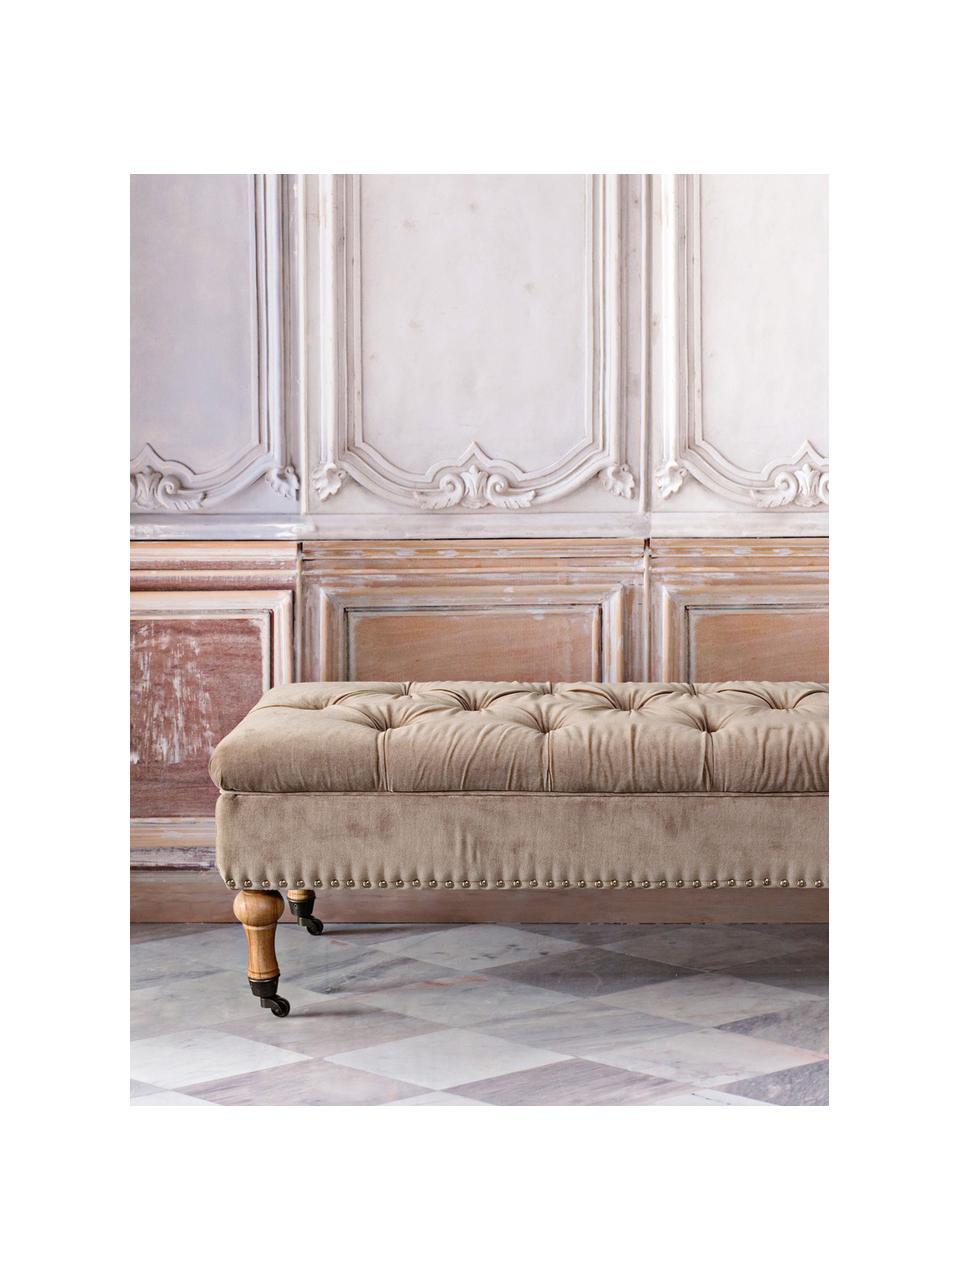 Fluwelen bank Arlette met opbergruimte, Bekleding: fluweel, Poten: dennenhout, Lichtbruin, dennenhout, zilverkleurig, 110 x 40 cm